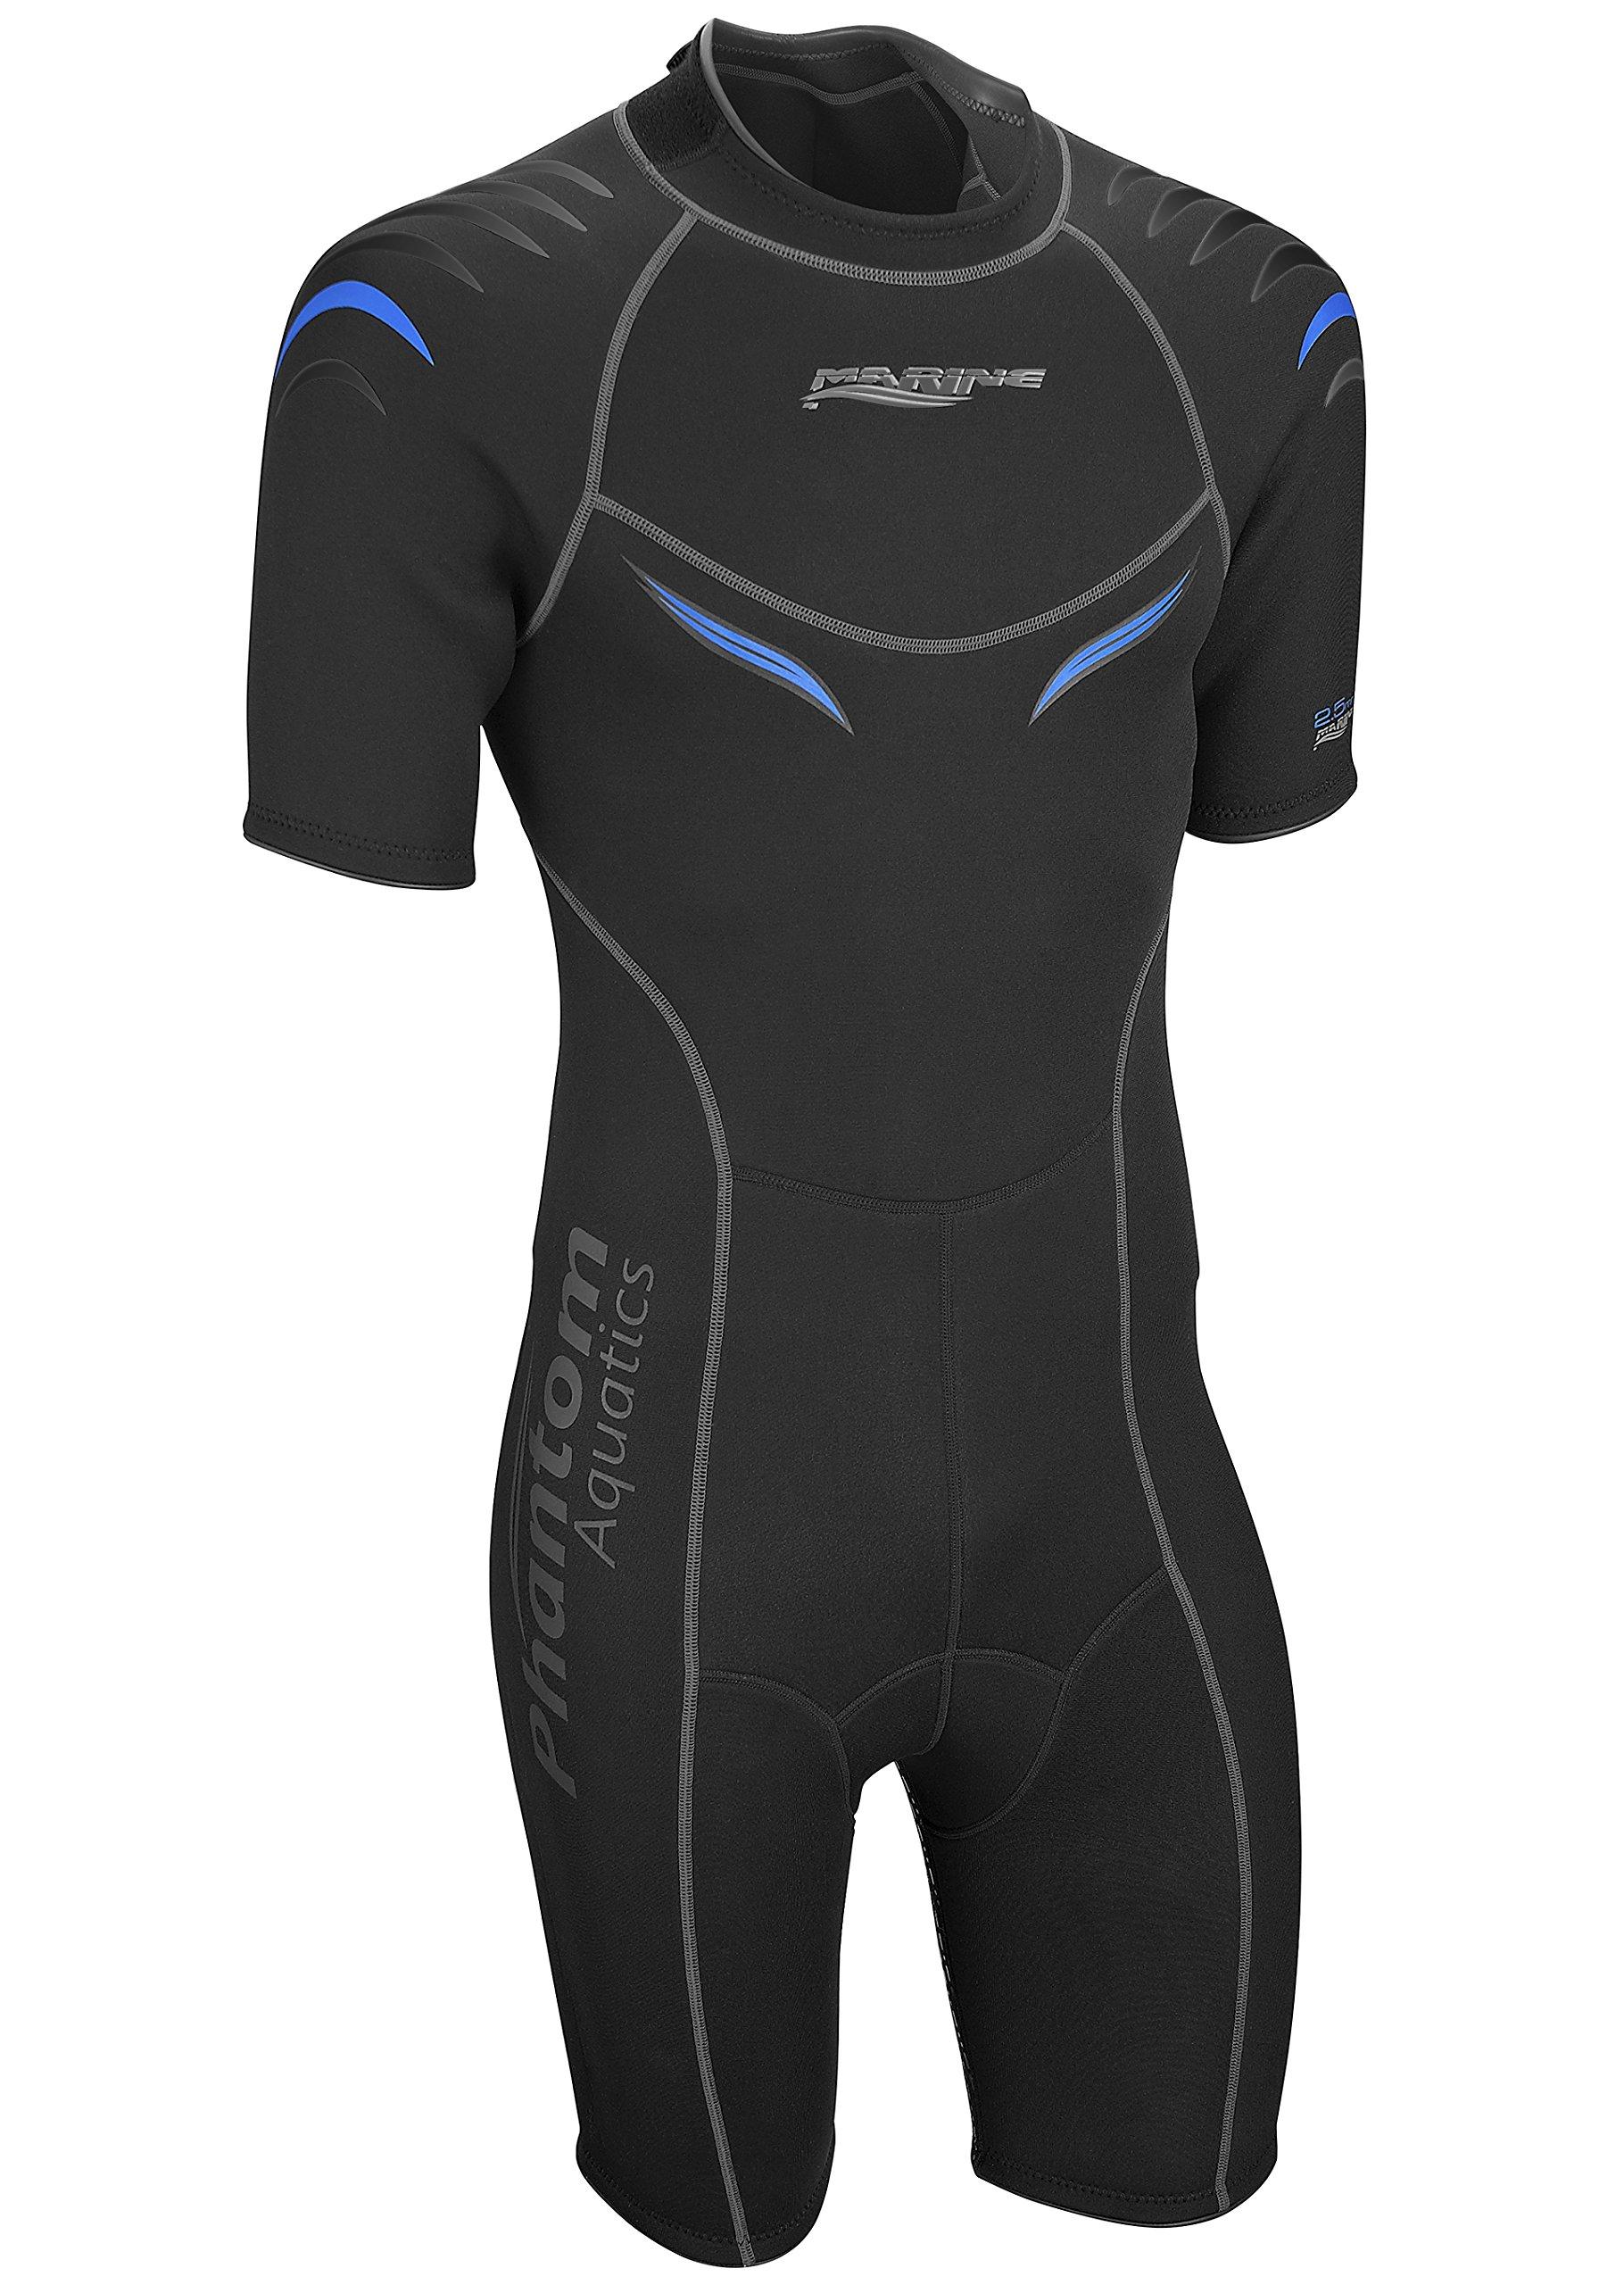 Phantom Aquatics Marine Men's Shorty Wetsuit, Black Blue - X-Large by Phantom Aquatics